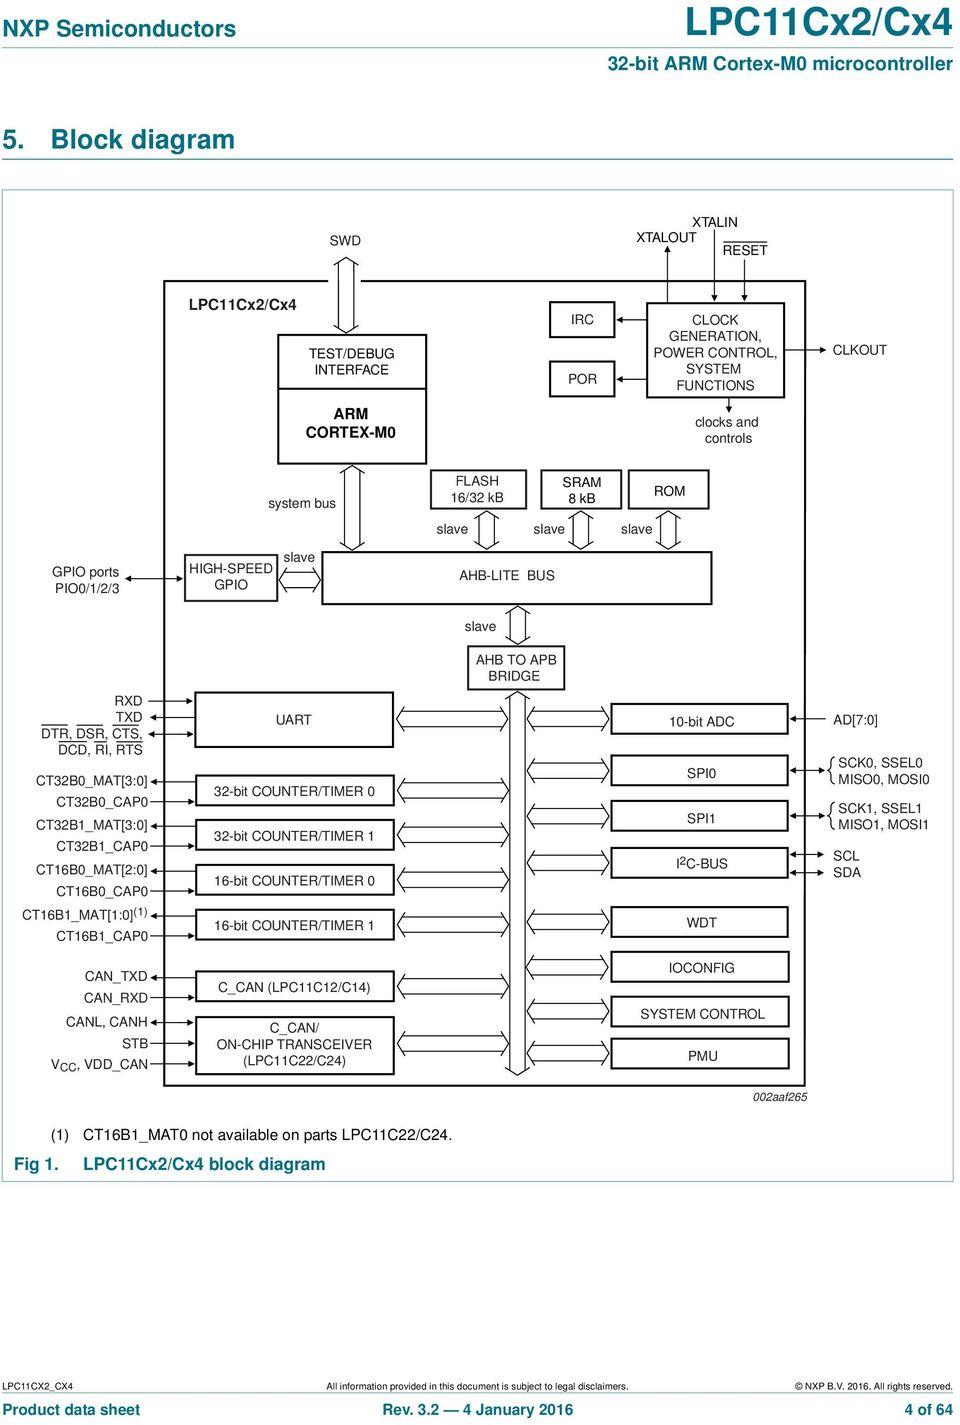 medium resolution of ct16b0 mat 2 0 ct16b0 cap0 uart 32 bit counter timer 0 32